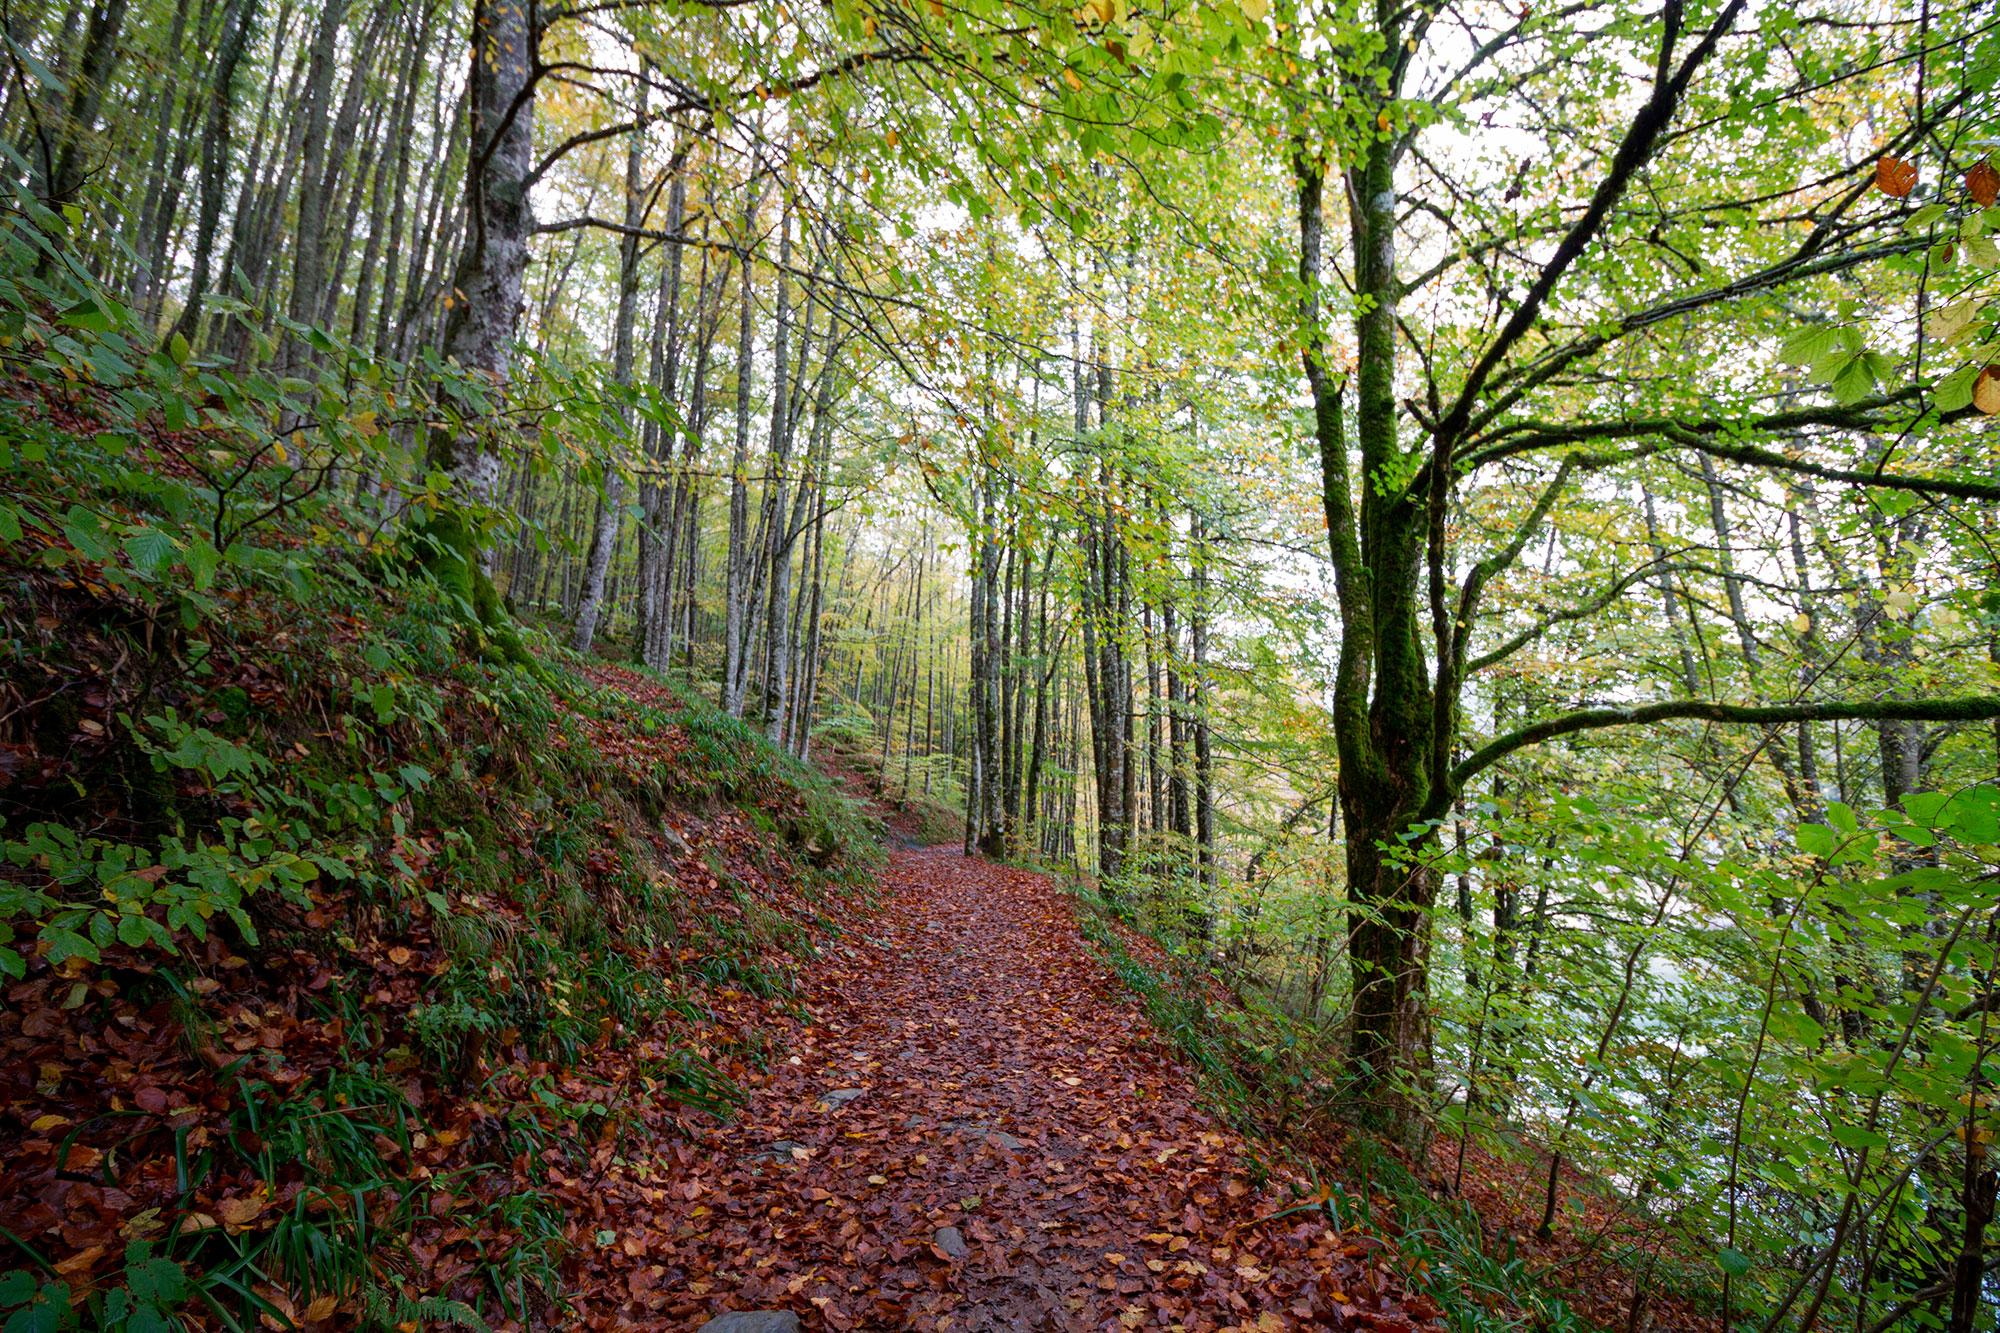 El otoño en la Selva de Irati y la Rioja alavesa - España- imagen #2